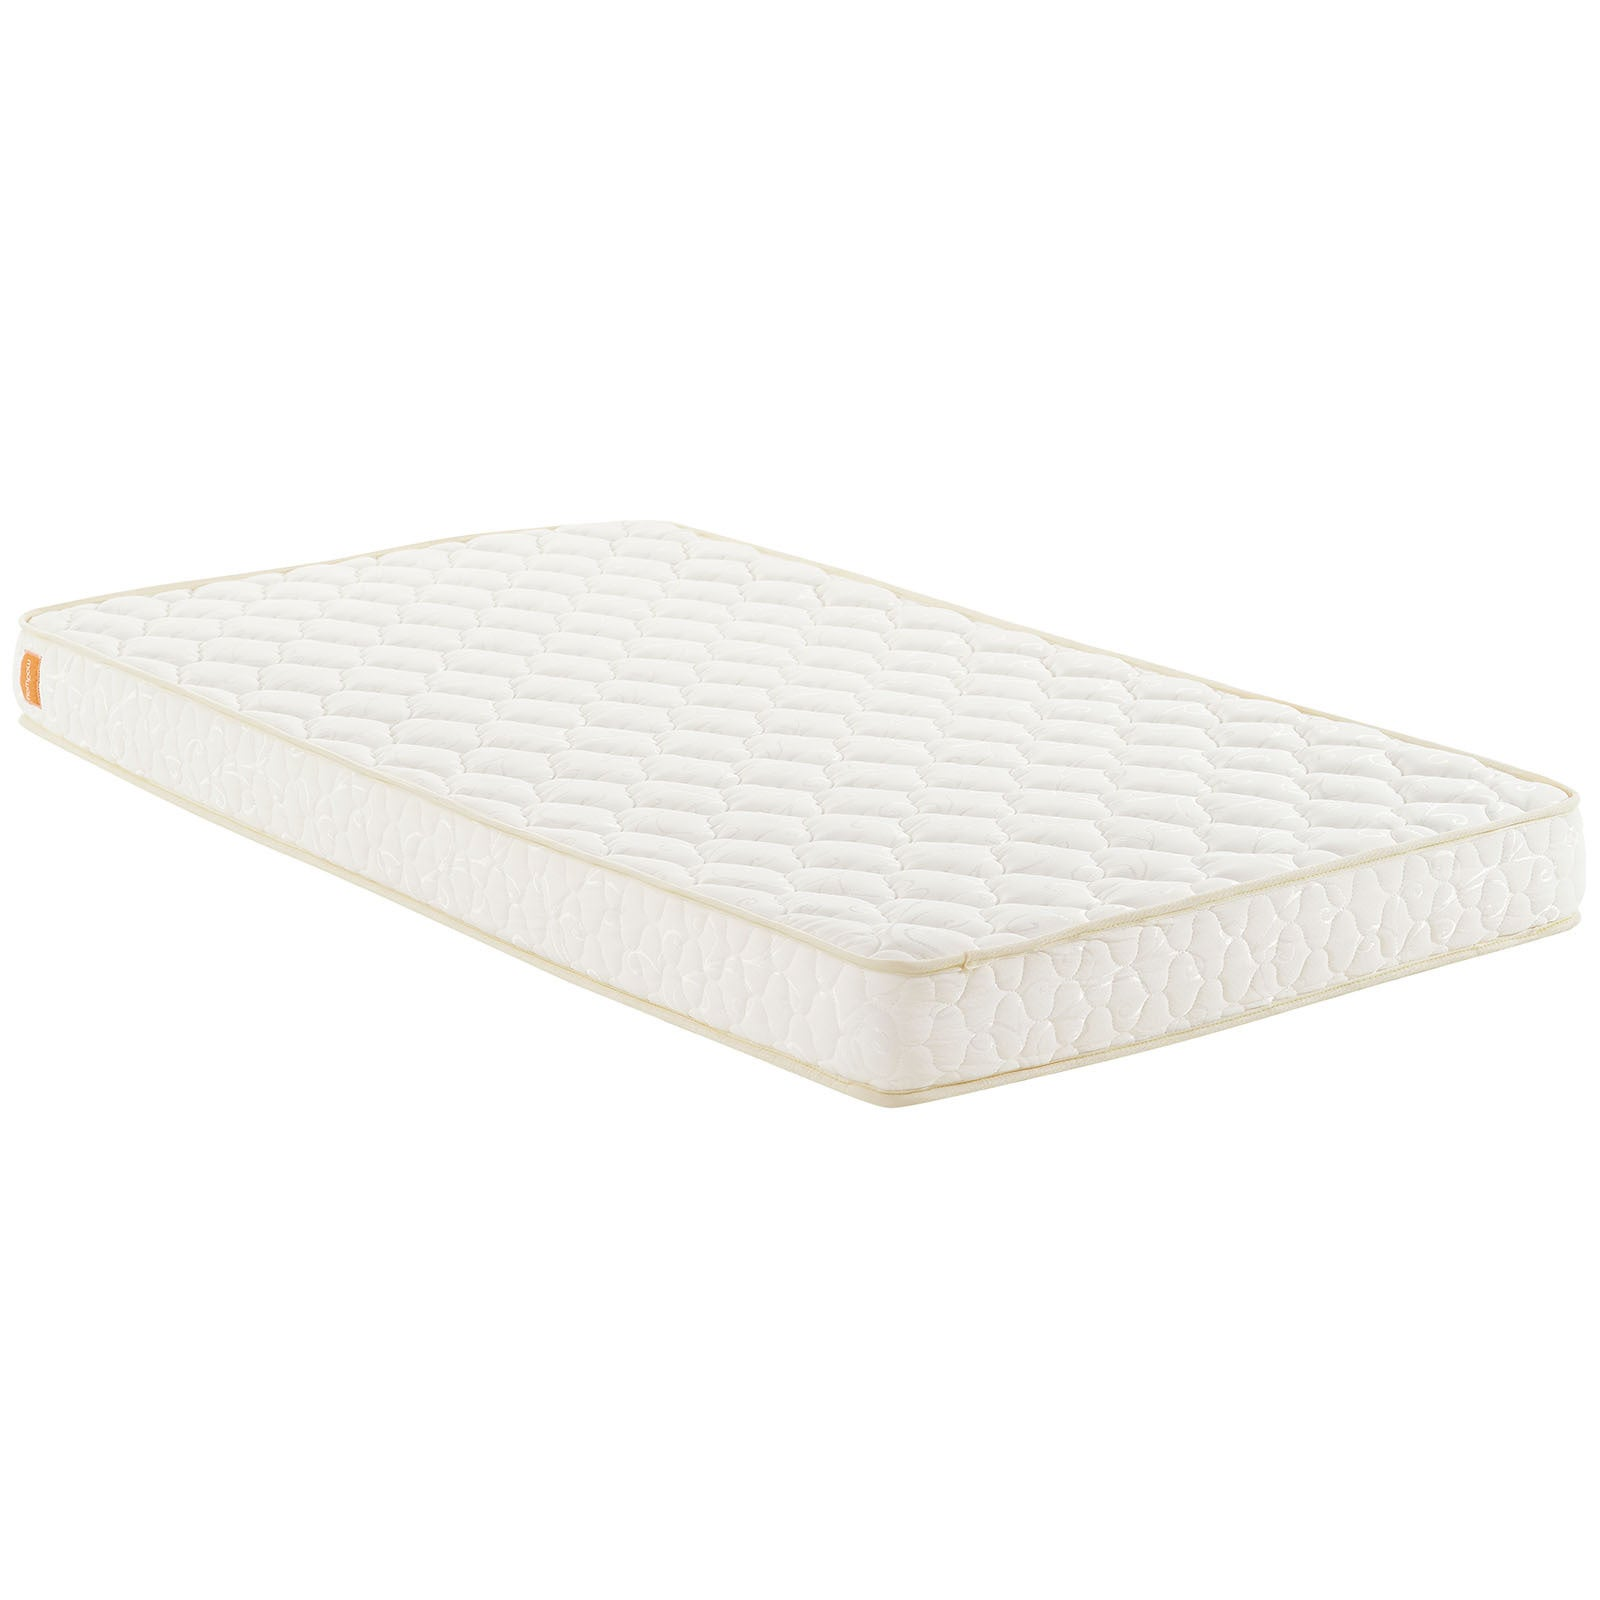 Emma 6 inch Memory Foam Twin size Mattress Free Shipping Today